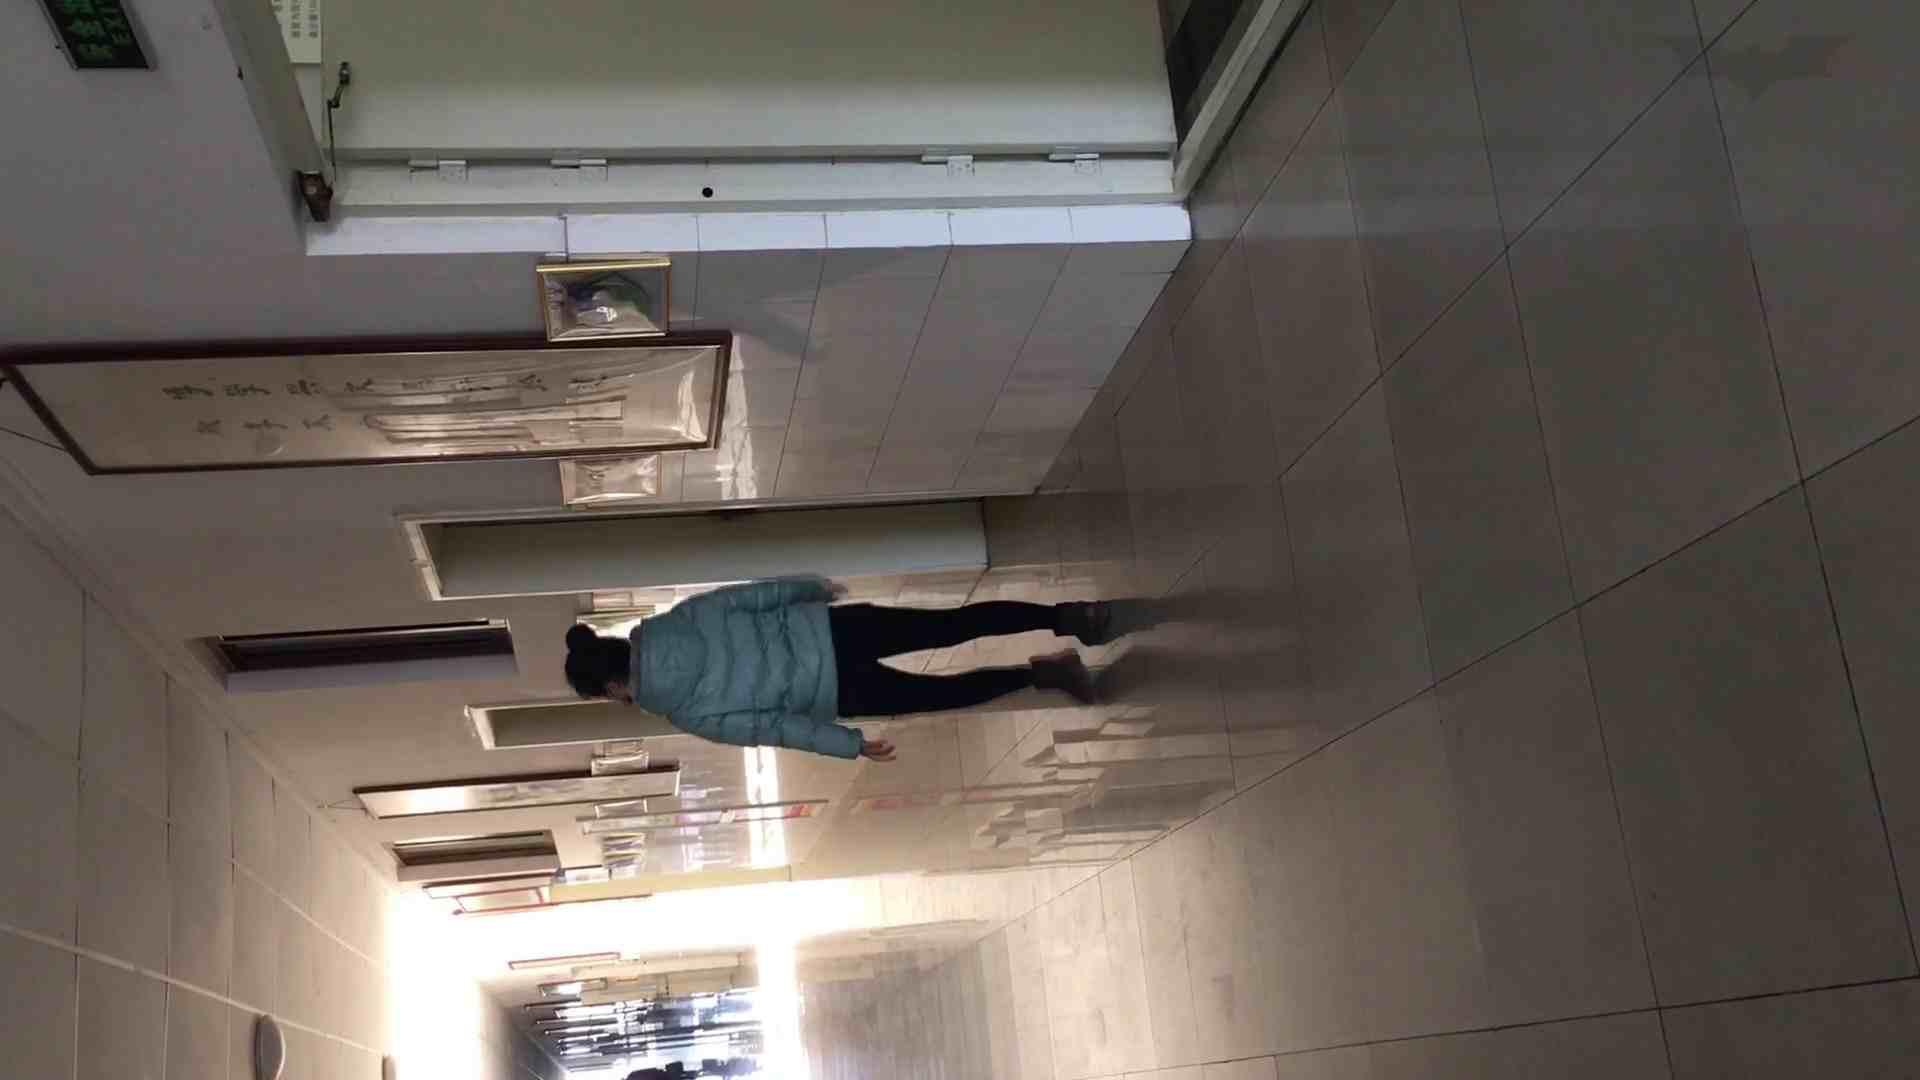 芸術大学ガチ潜入盗撮 JD盗撮 美女の洗面所の秘密 Vol.89 洗面所着替え | 潜入エロ調査  77連発 10